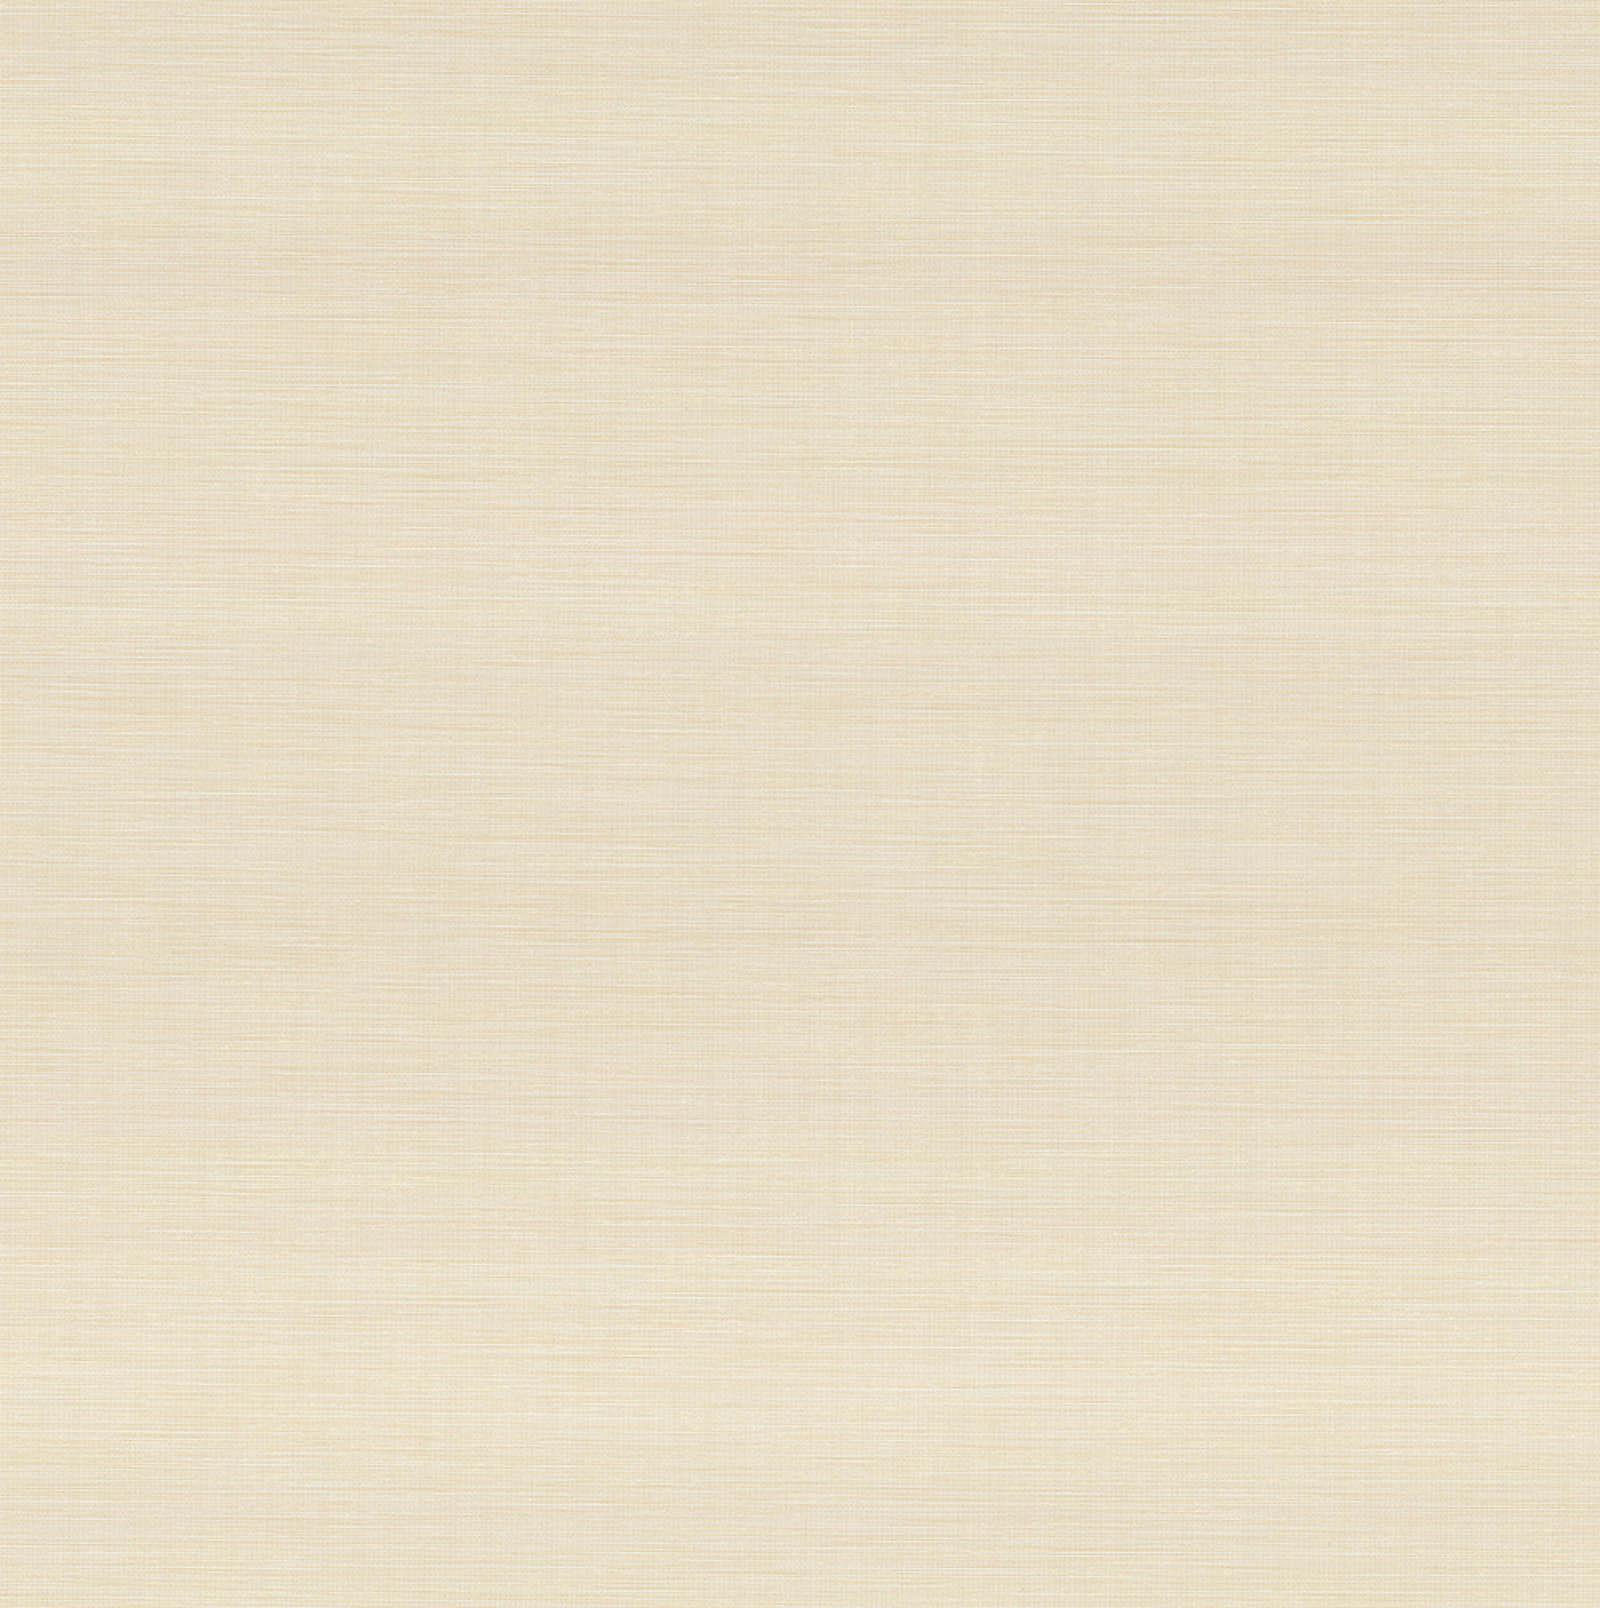 Рулонные шторы Уни2 Корсо_Intсветло-бежевый